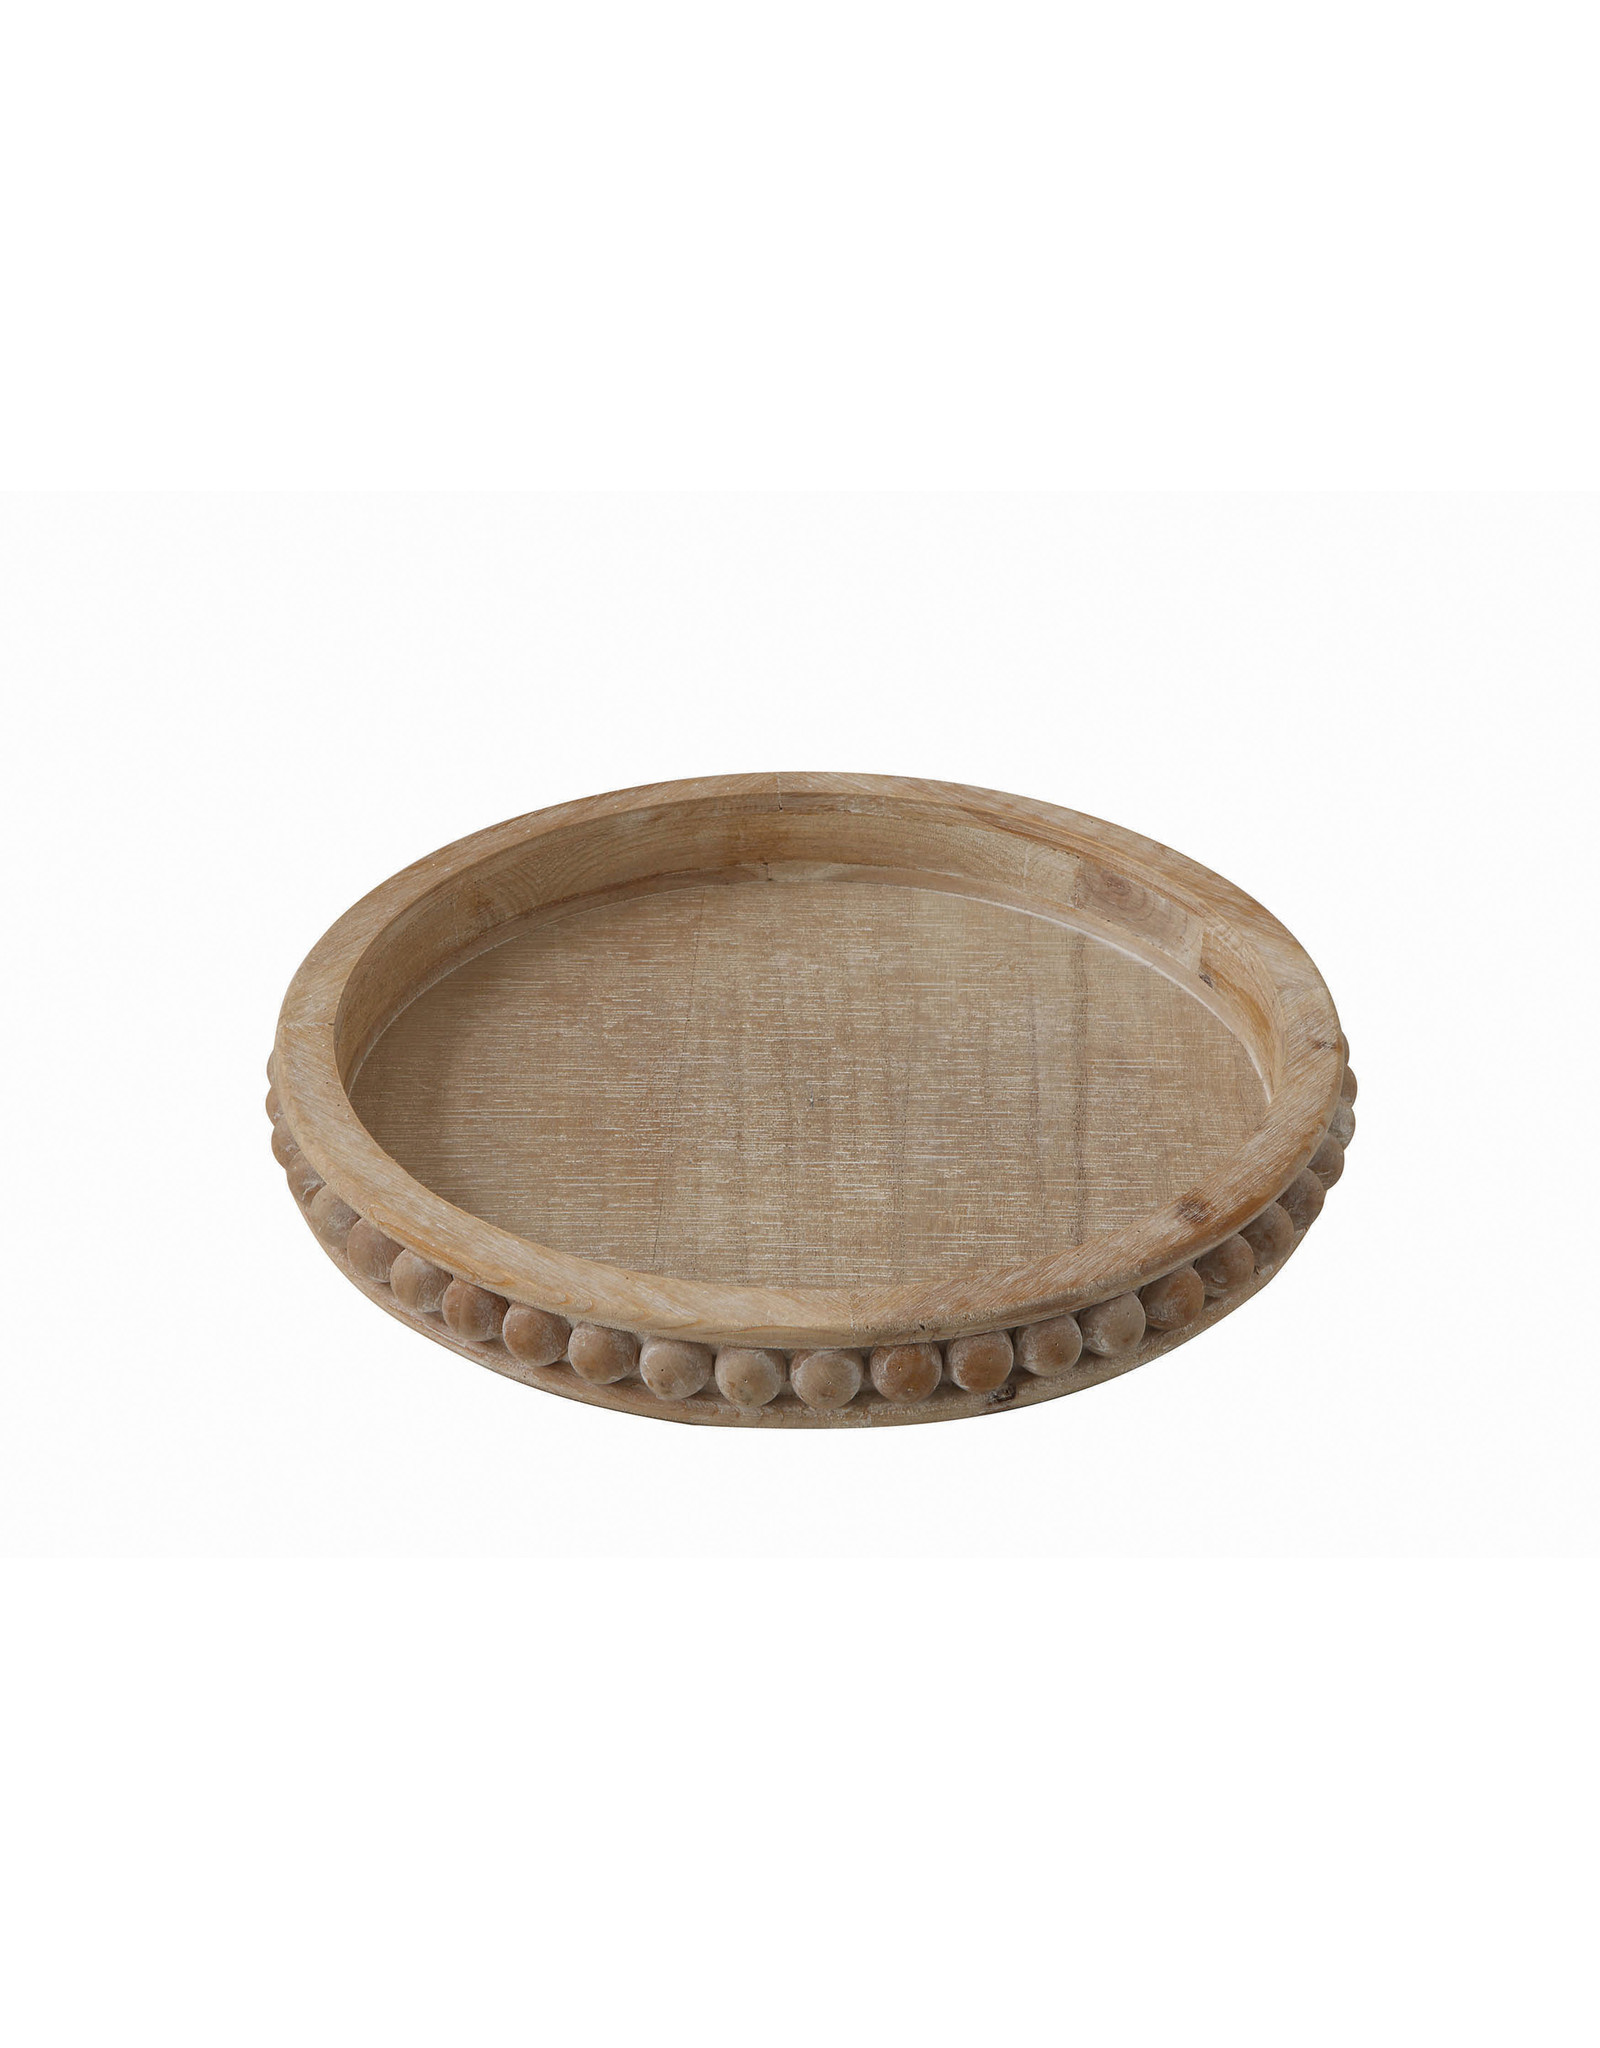 Website Round Decorative Wood Tray